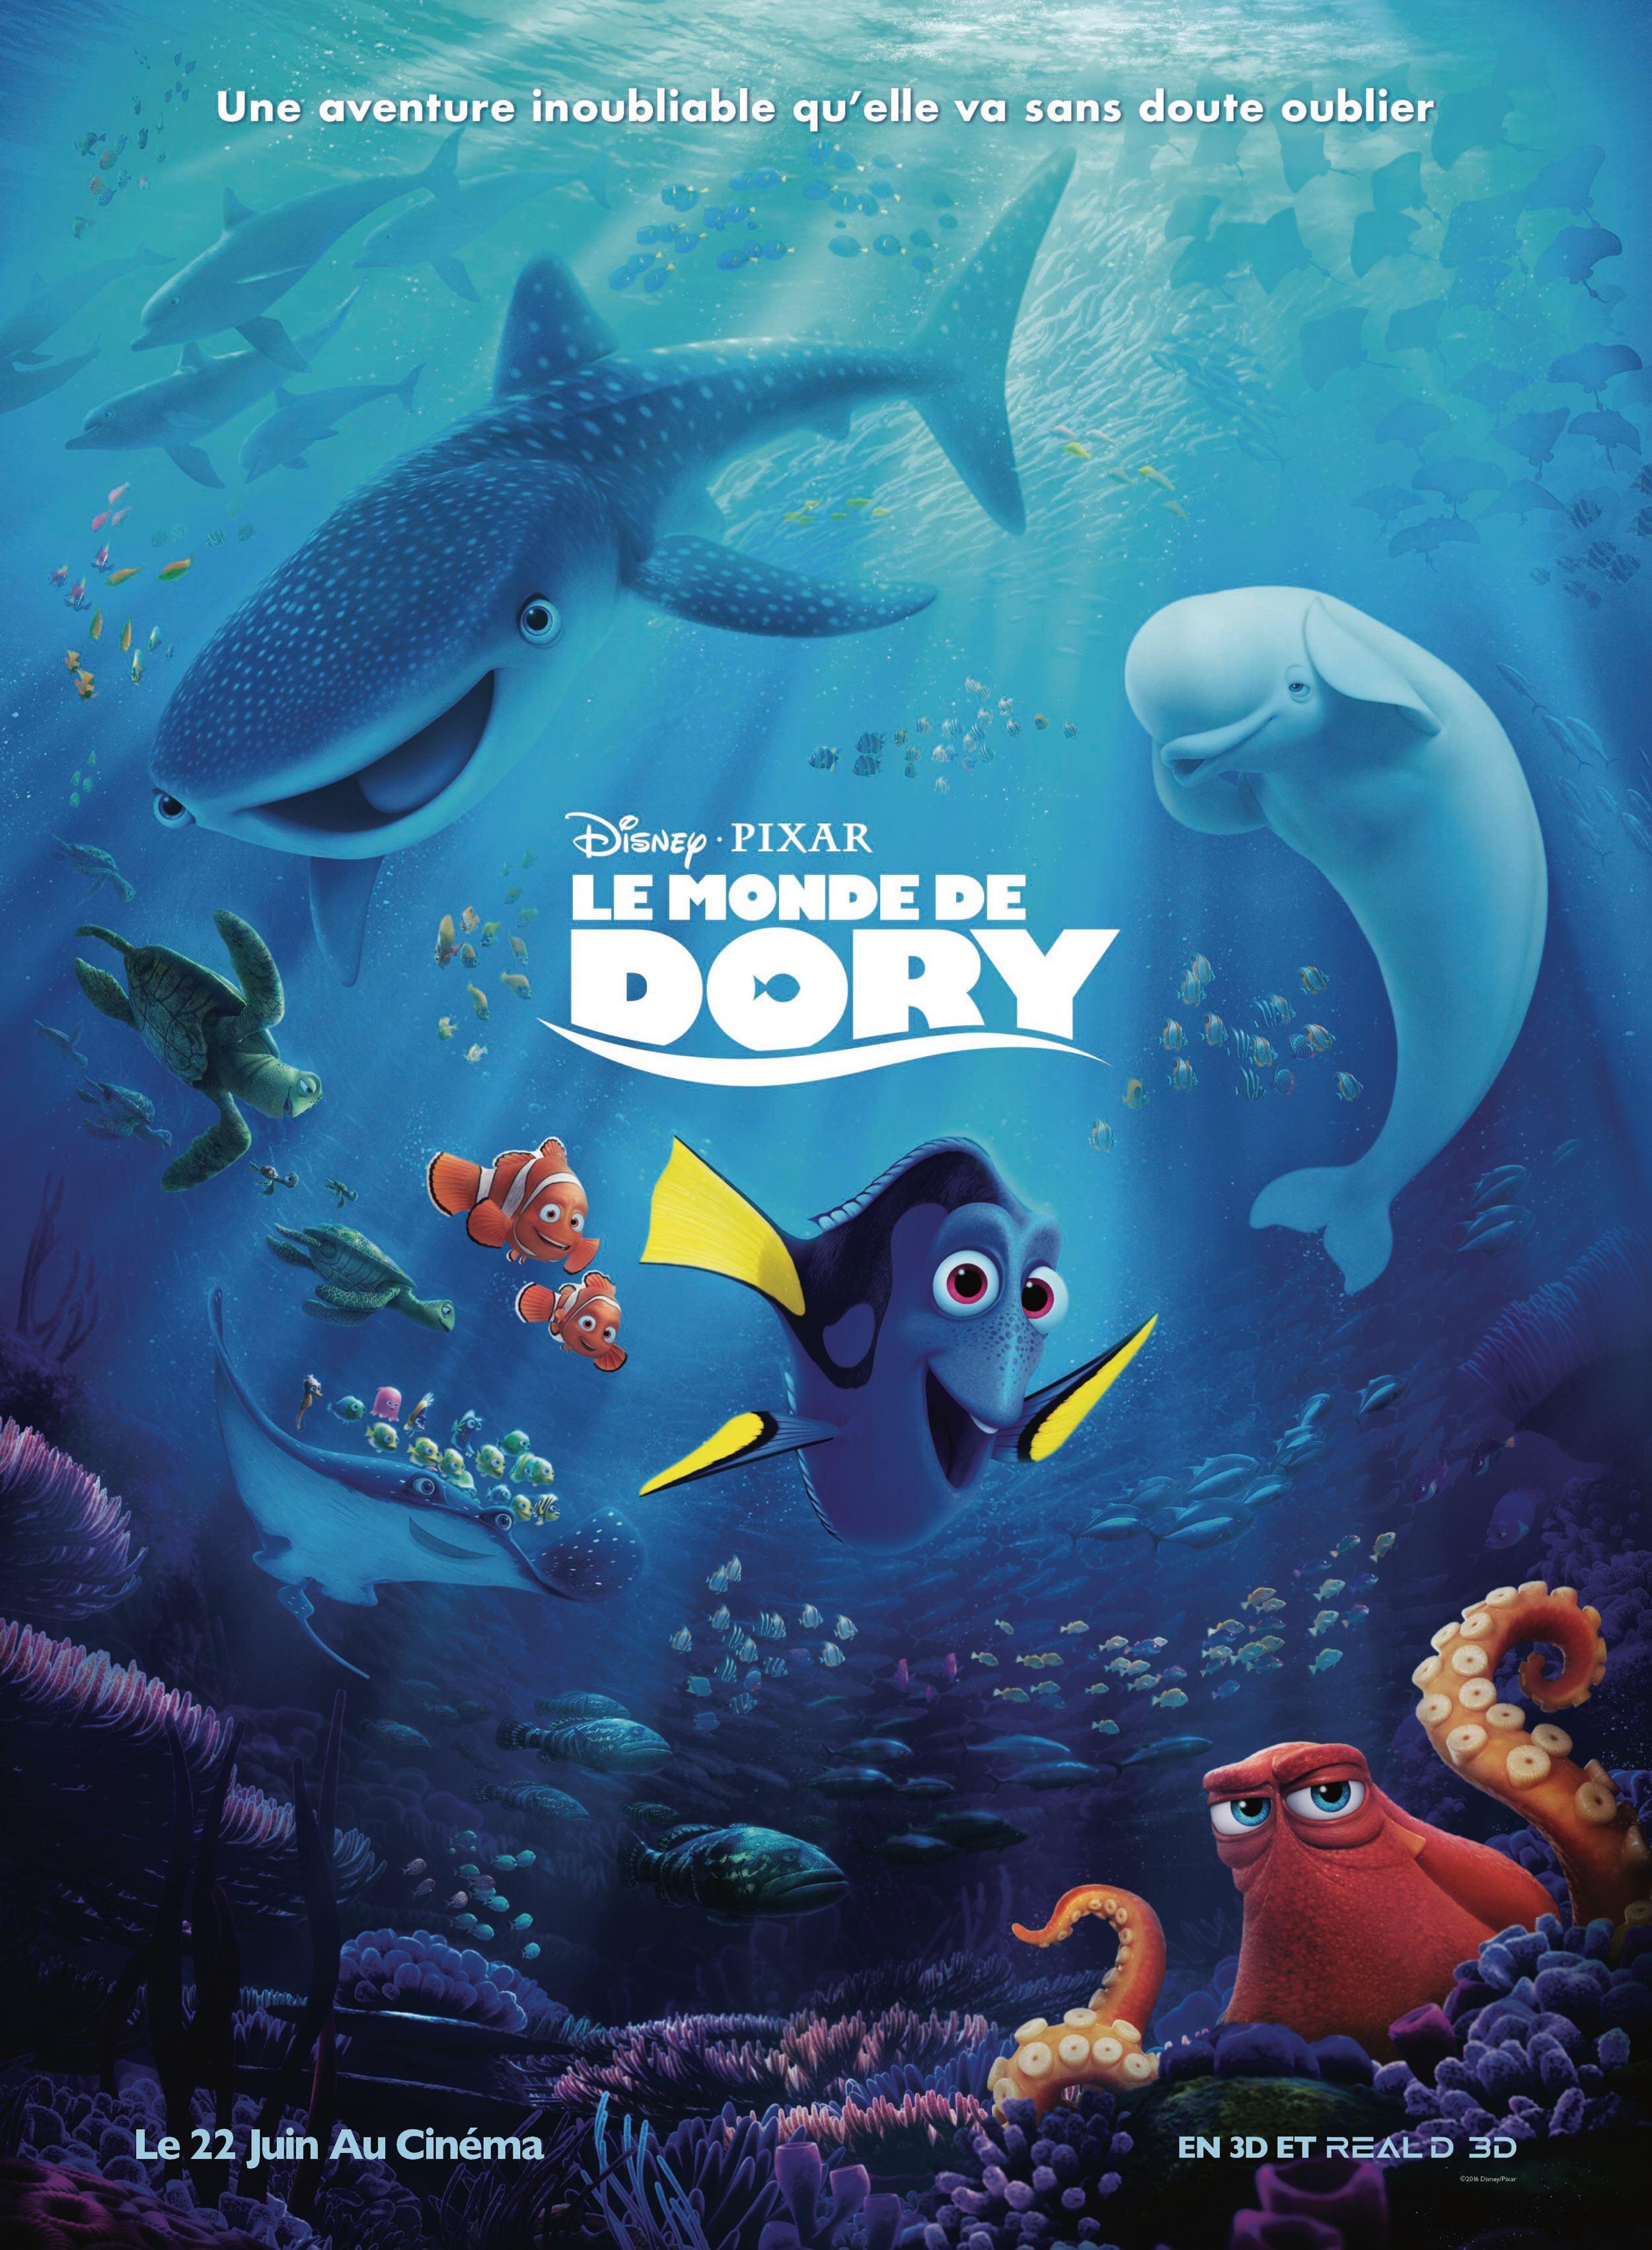 monde-dory-stanton-maclane-pixar